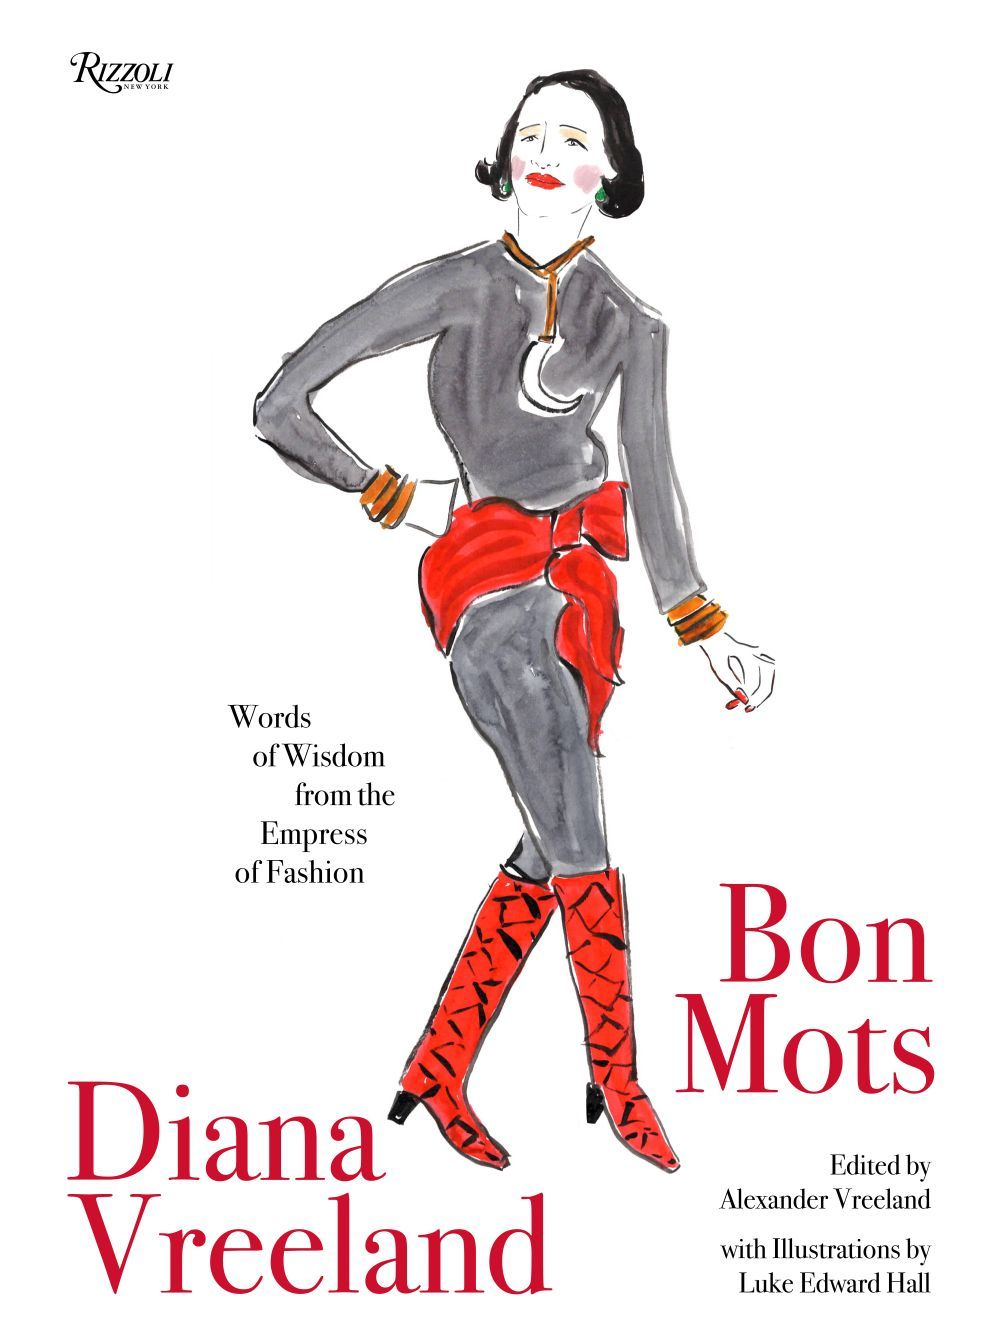 Portada del libro Bon Mots: Words of Wisdom from the Empress of...